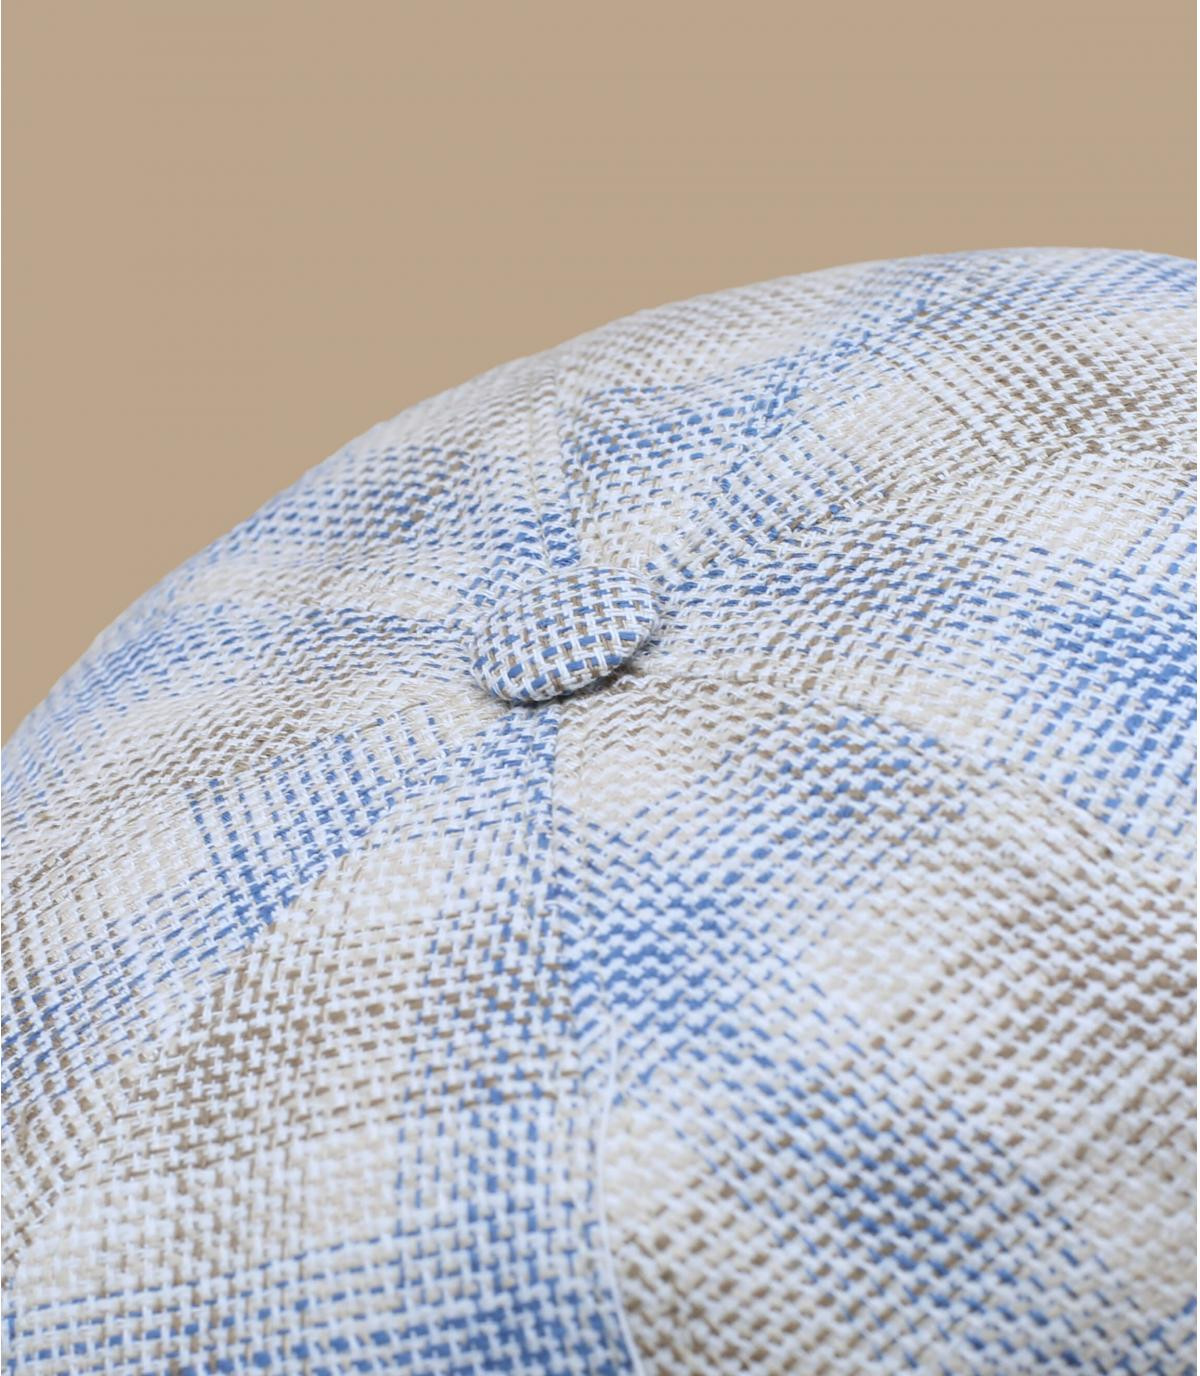 Detalles Staffy Cohiba beige blue imagen 2